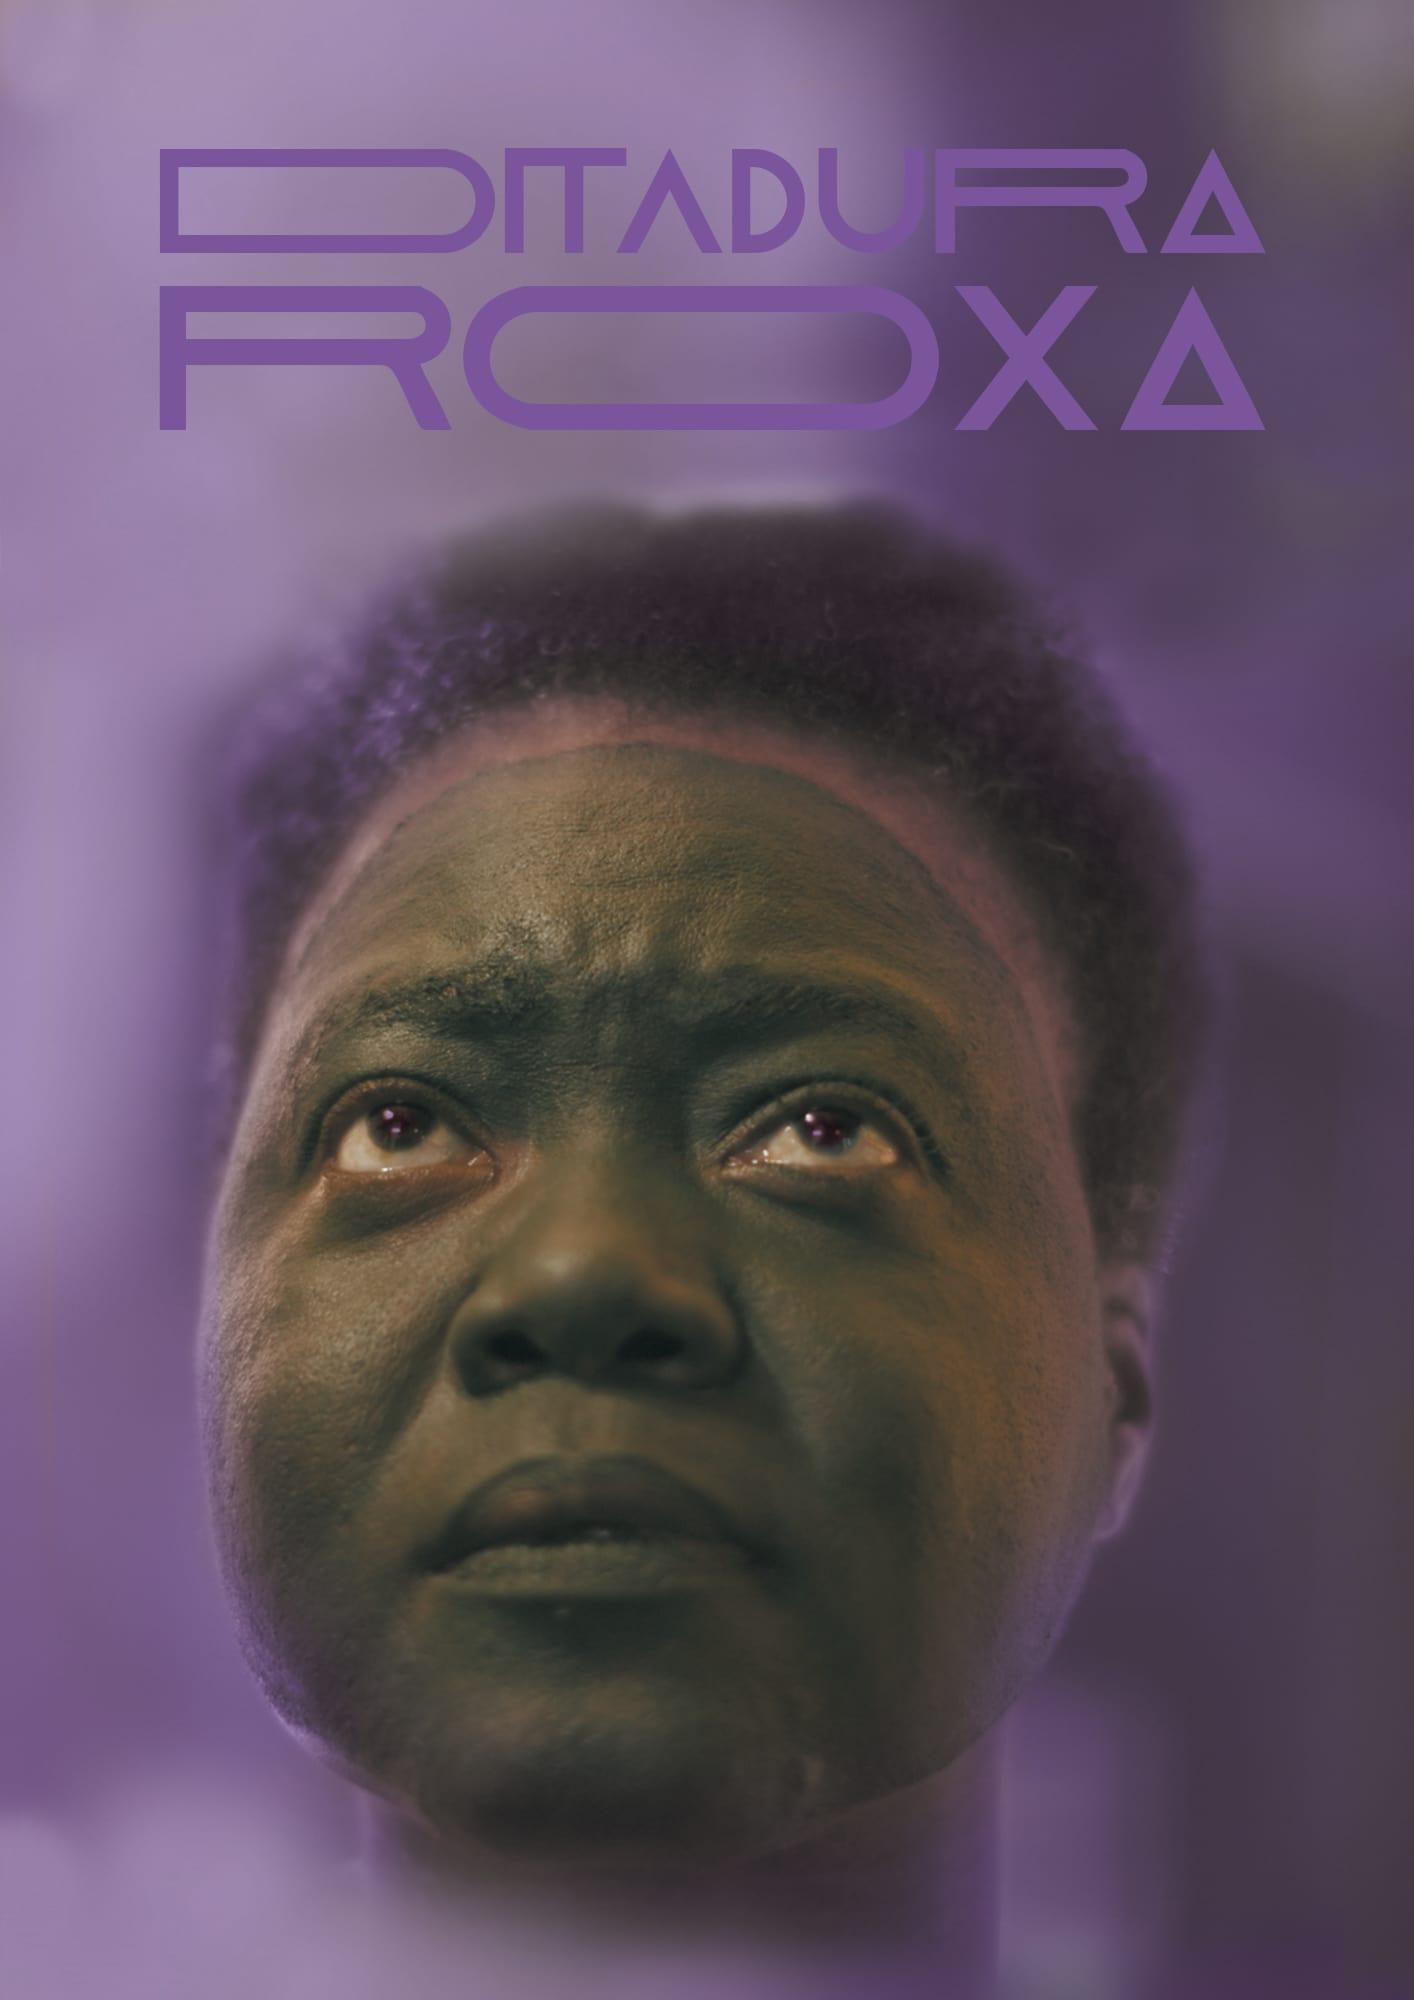 Regarder Ditadura Roxa en streaming gratuit